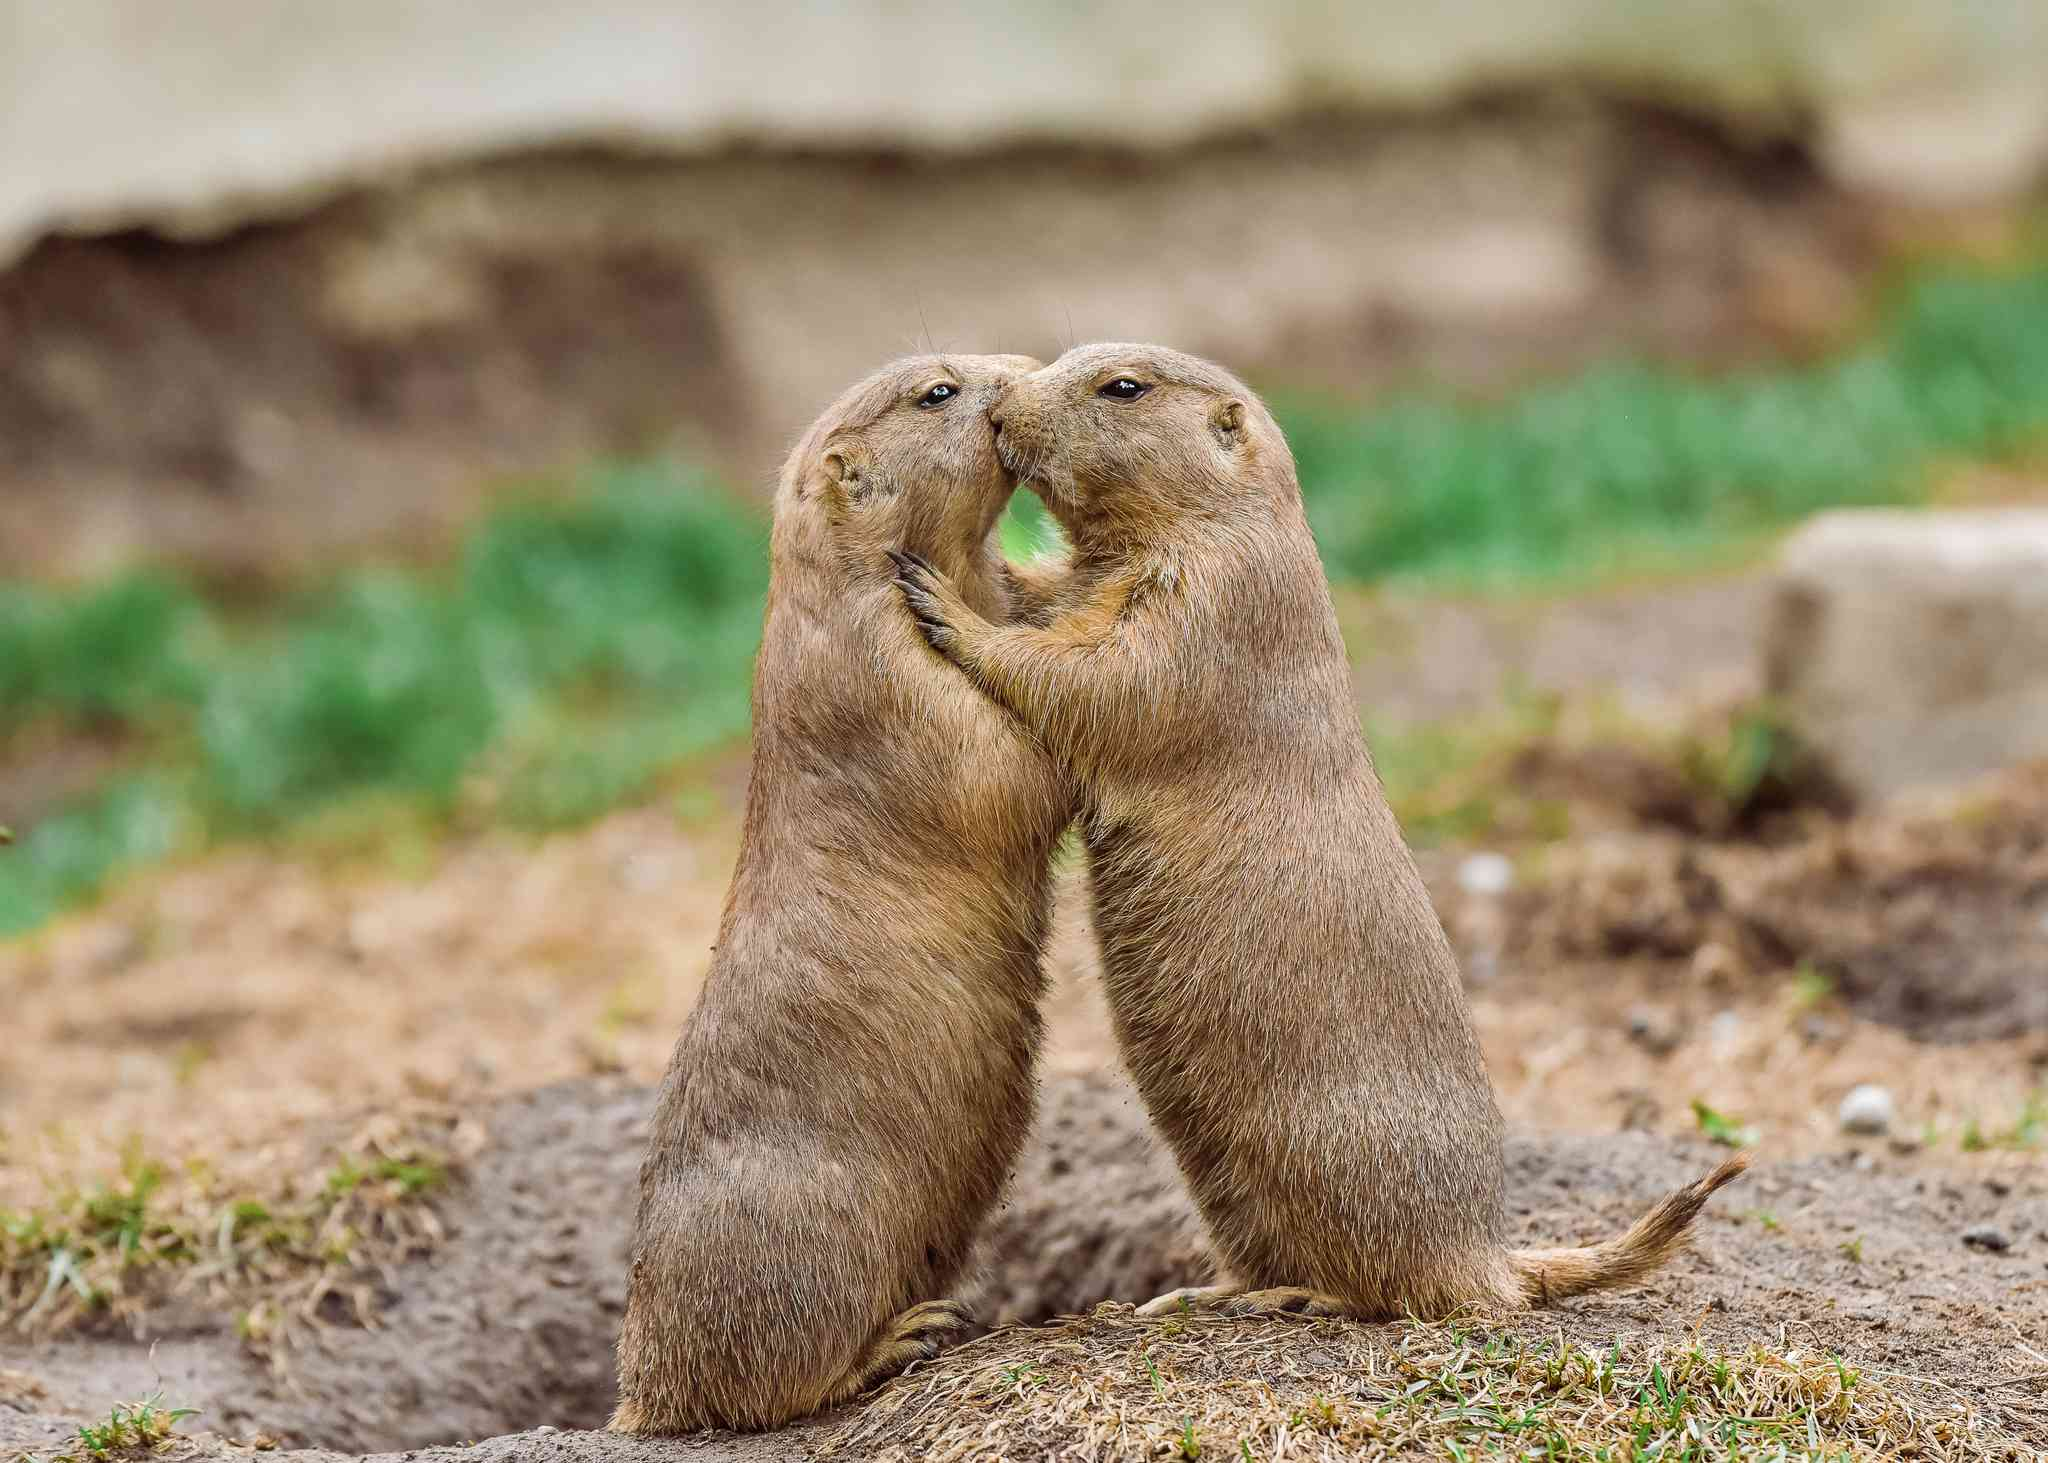 Prairie dogs greet-kissing outside a burrow